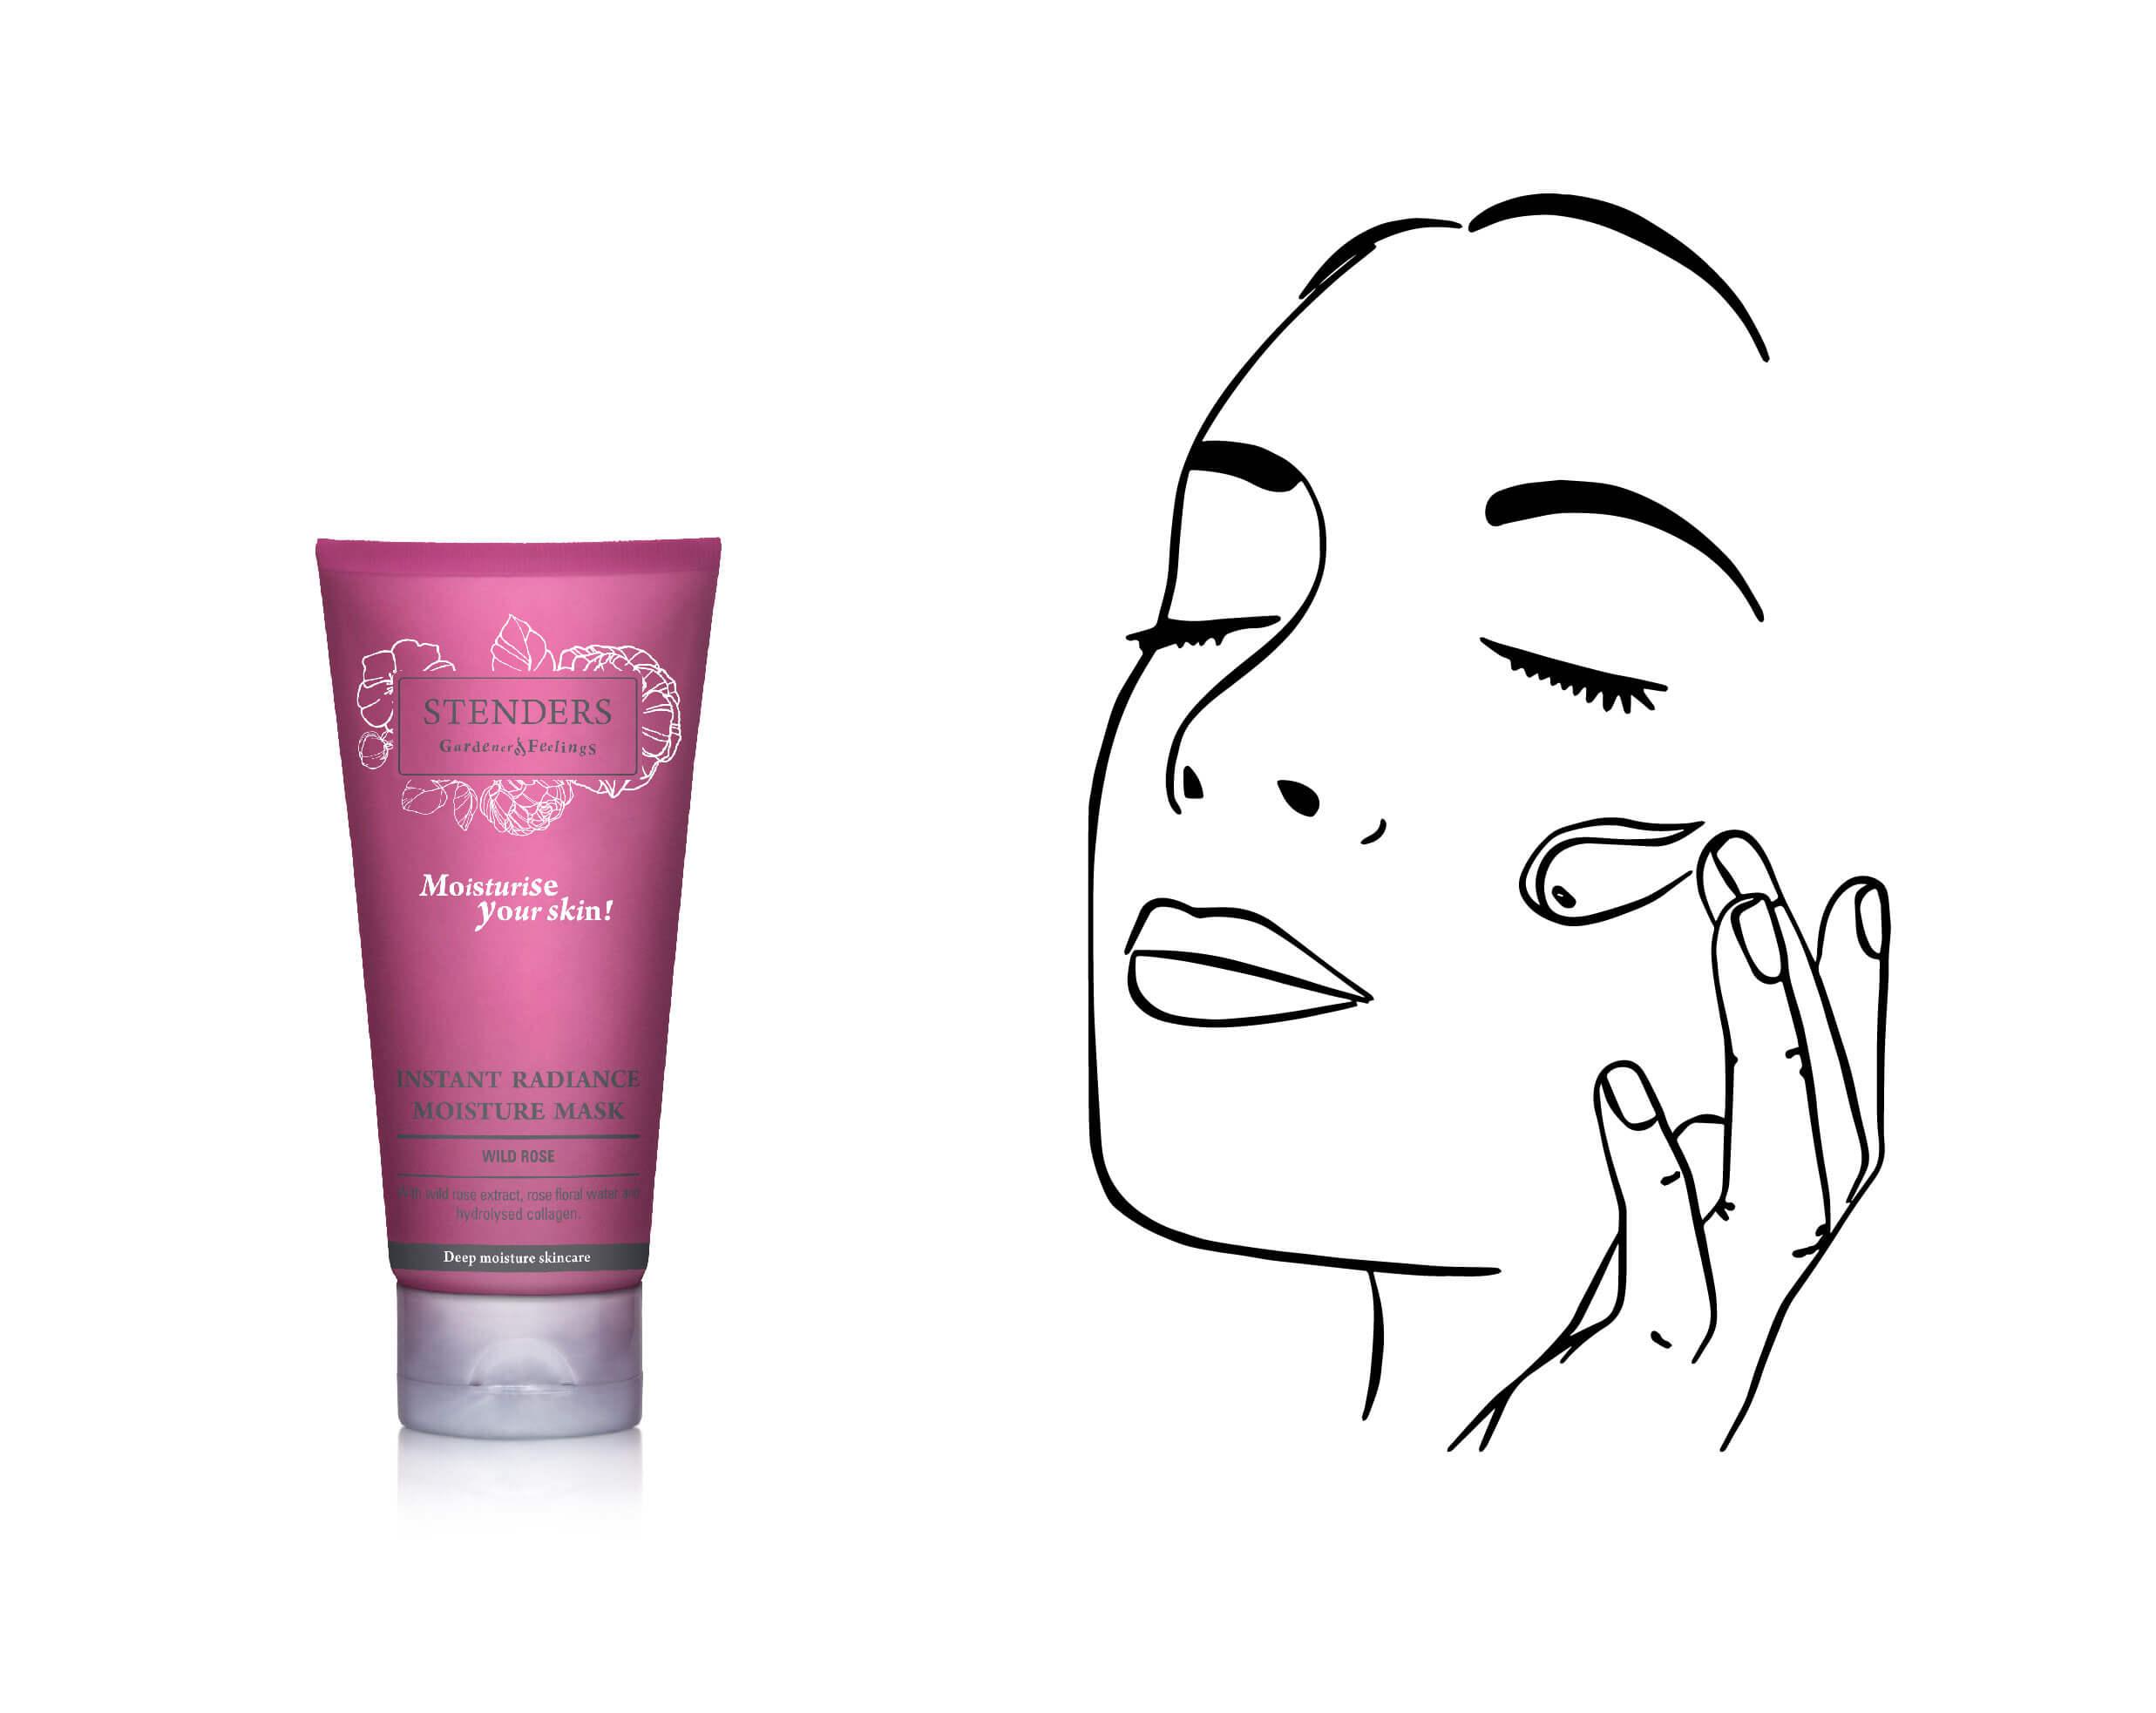 Use Wild Rose Instant Radiance Moisture Mask